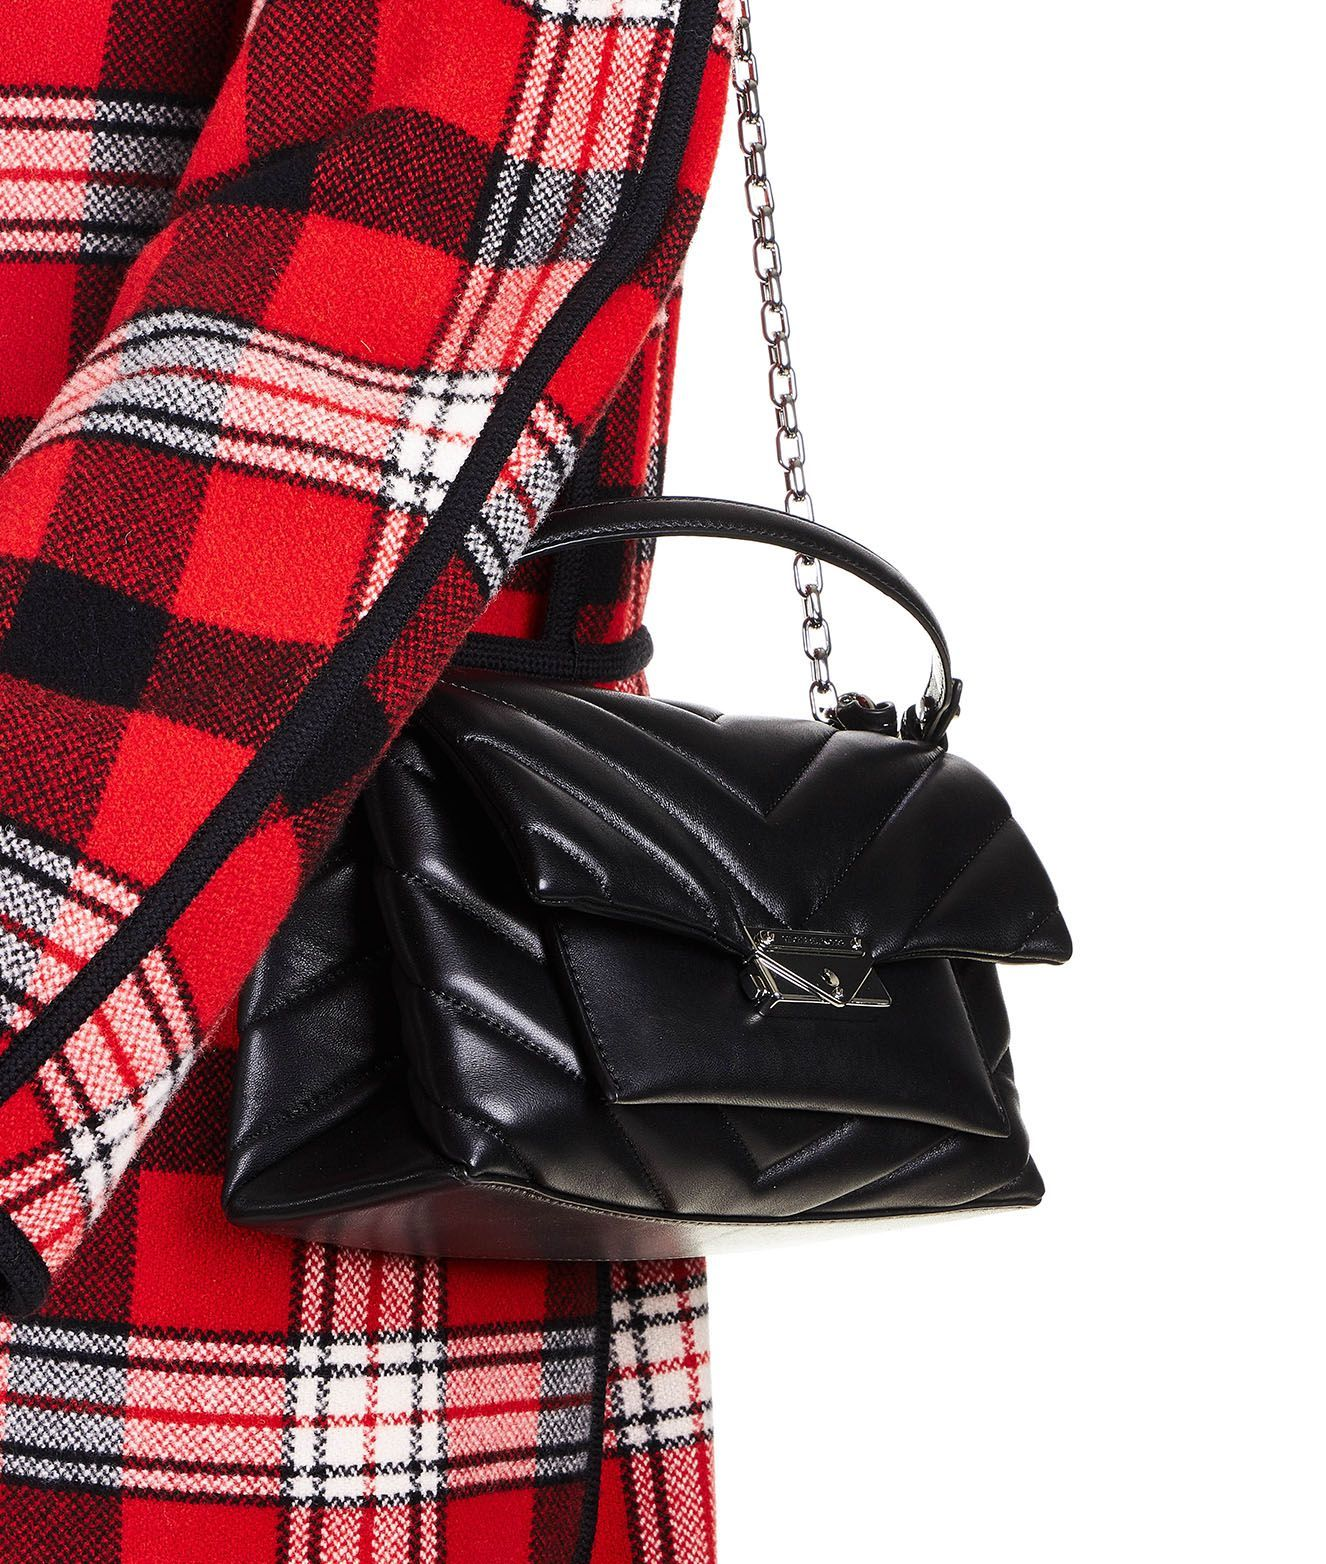 MICHAEL KORS WOMEN'S 30T9S0EL8L001 BLACK LEATHER SHOULDER BAG